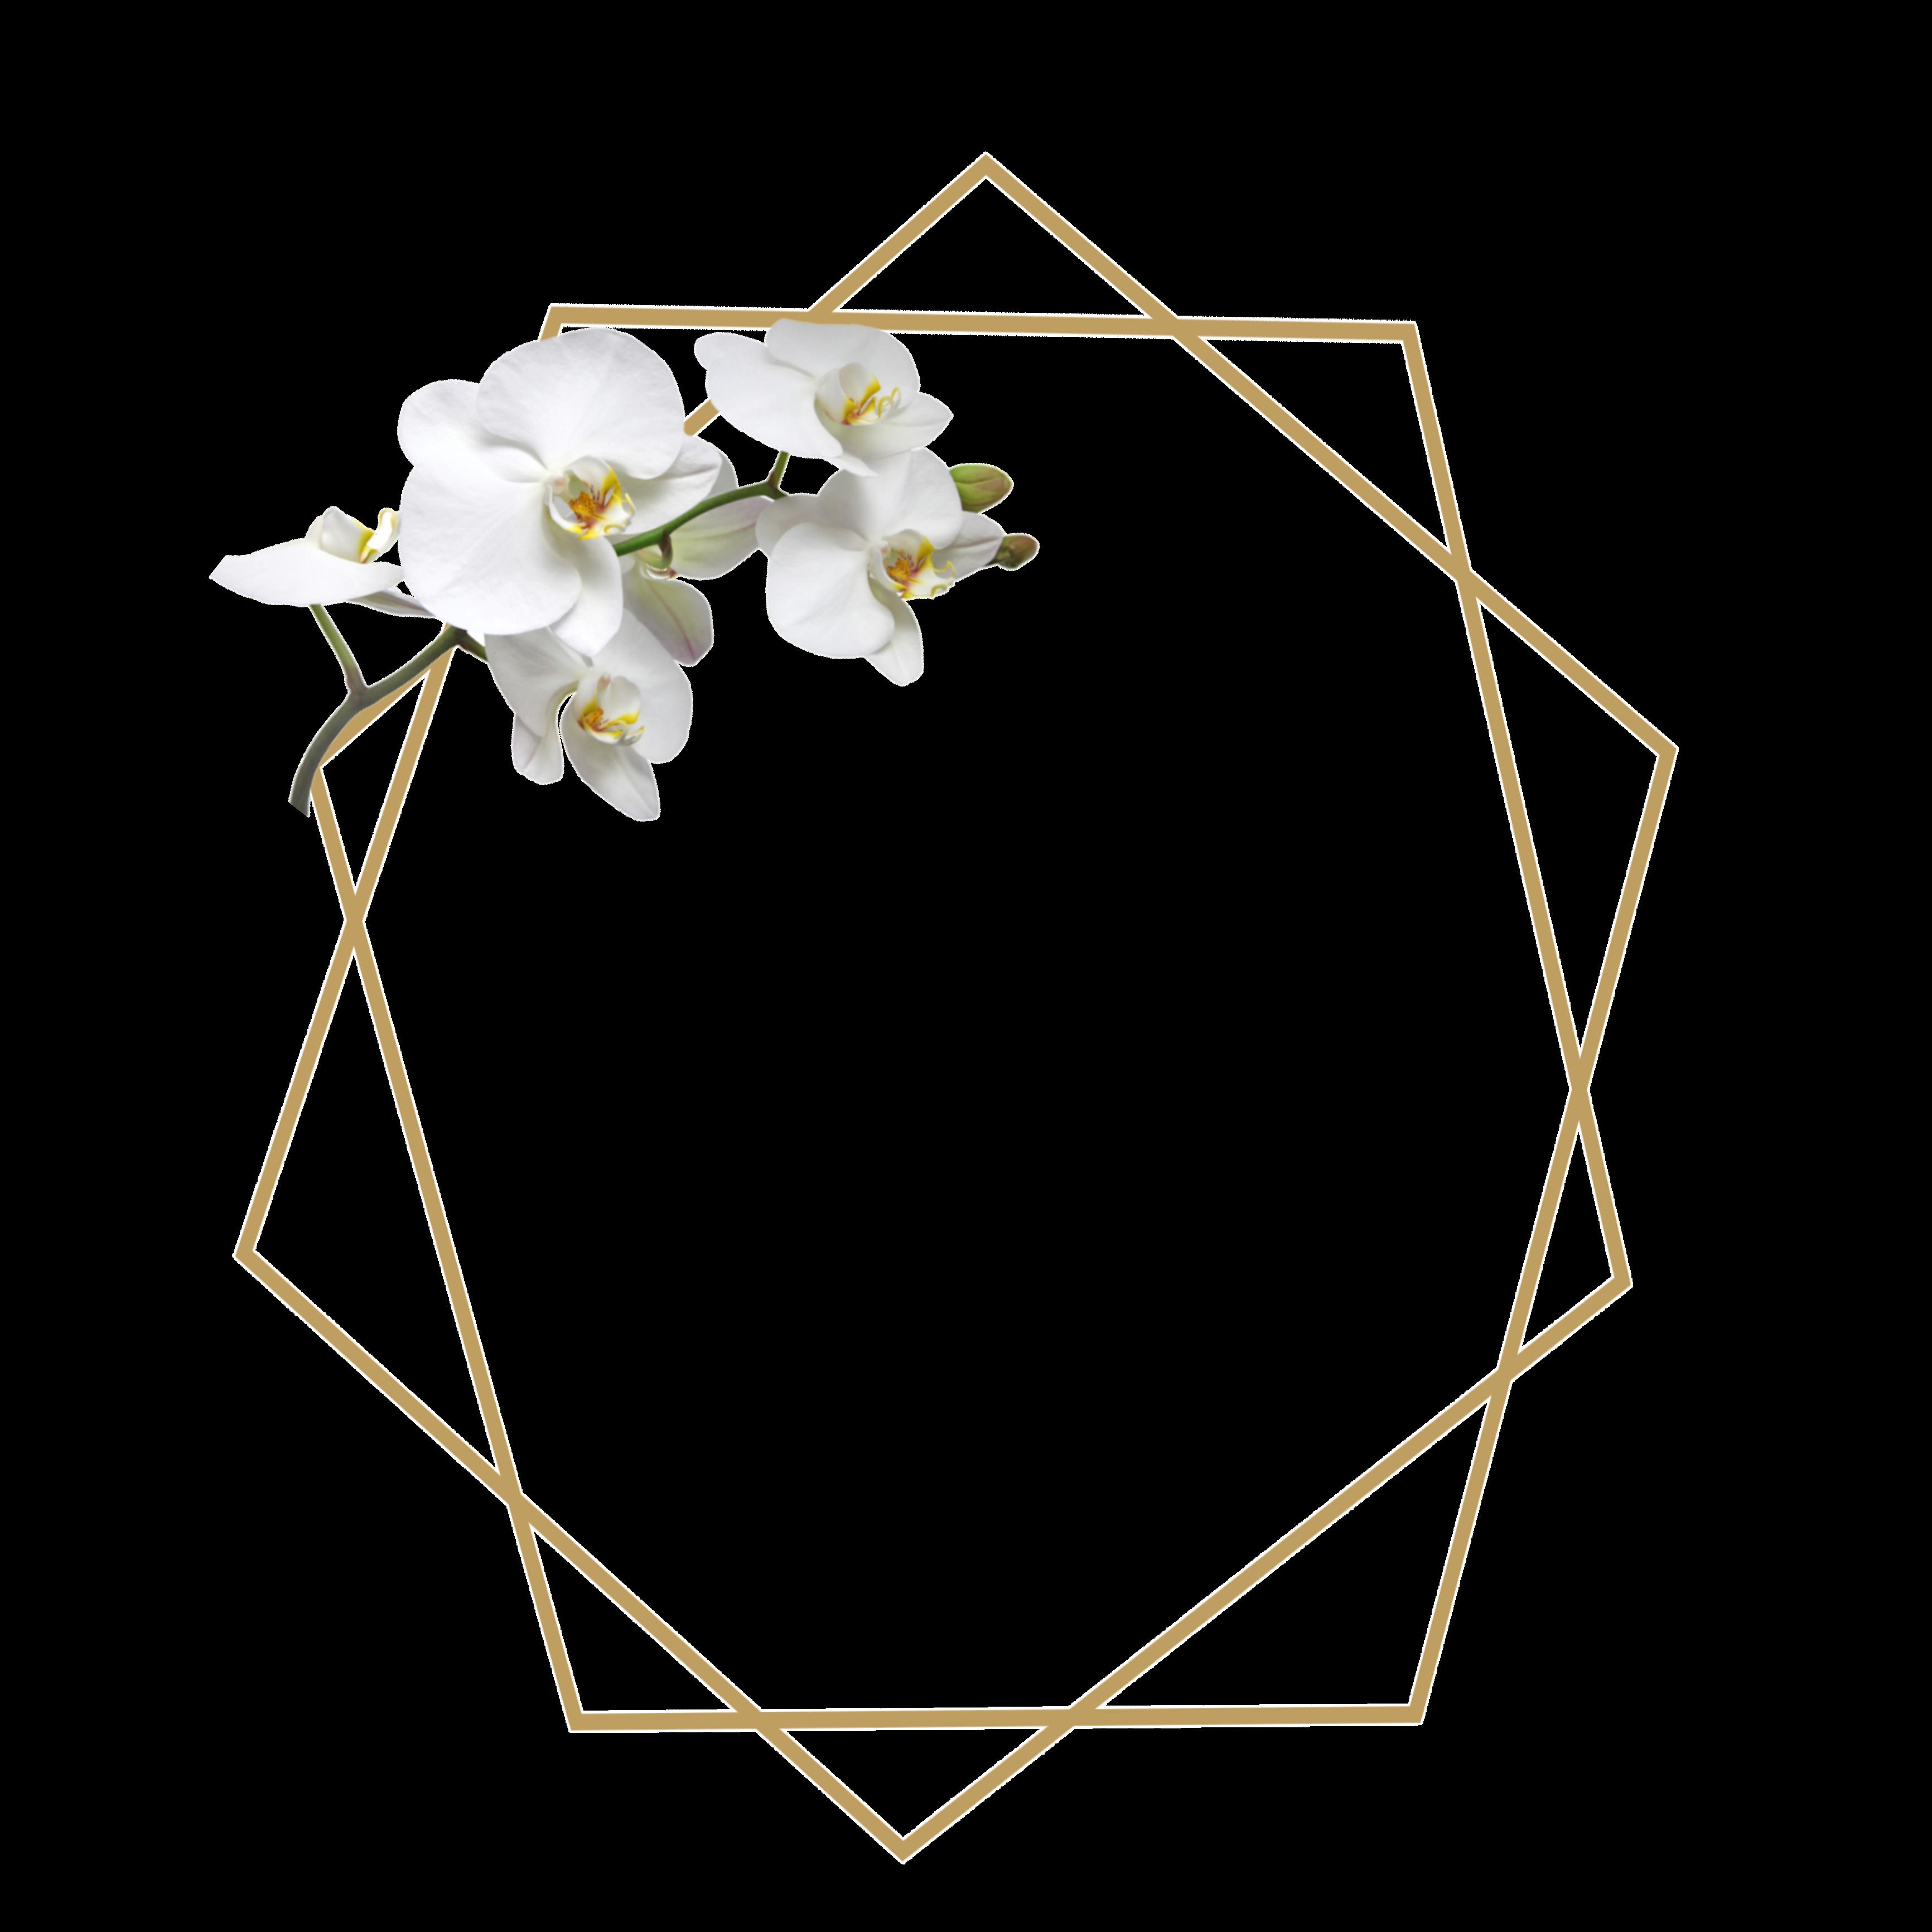 Freetoedit ورد اوركيد ثيم ذهبي اطار Remixed From Mashaelpicsart Roroalrrr Flower Graphic Design Floral Border Design Flower Background Iphone